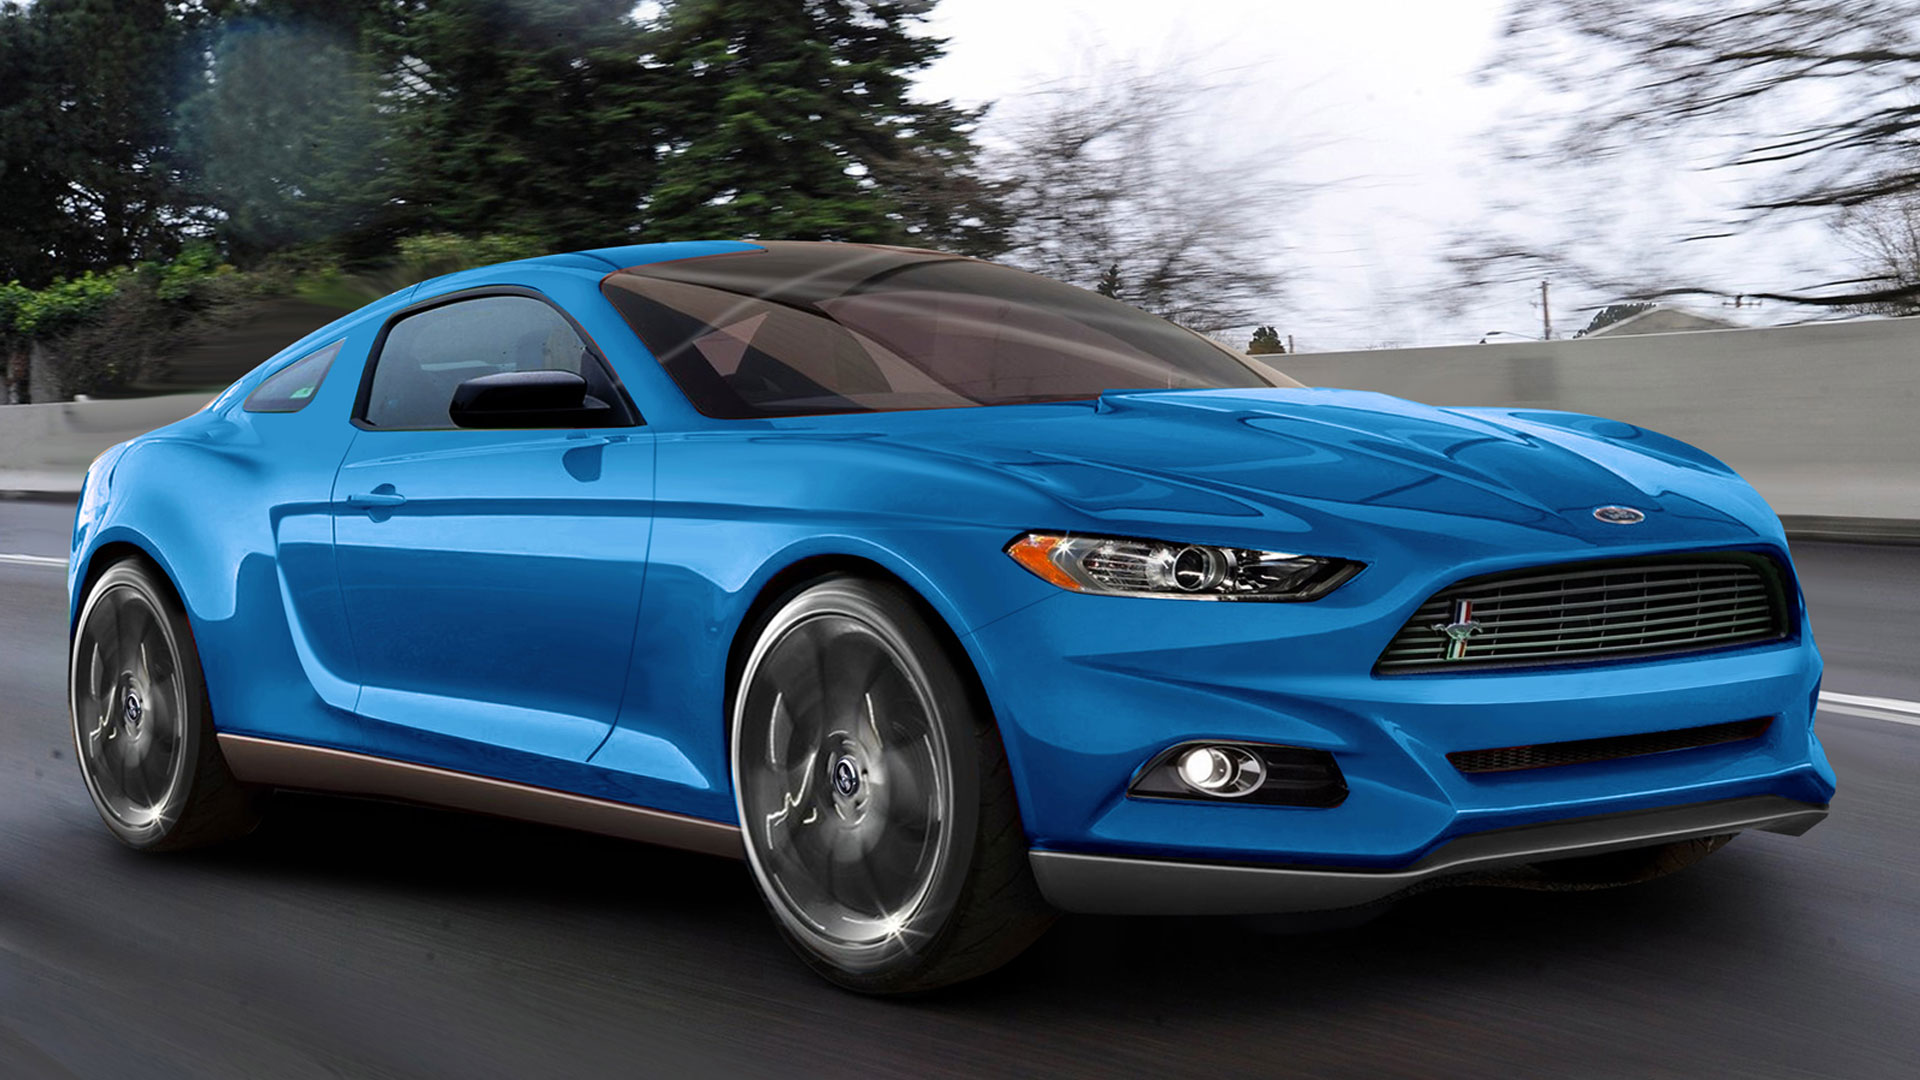 2015 Ford Mustang GT HD Wallpaper   HD 1920x1080